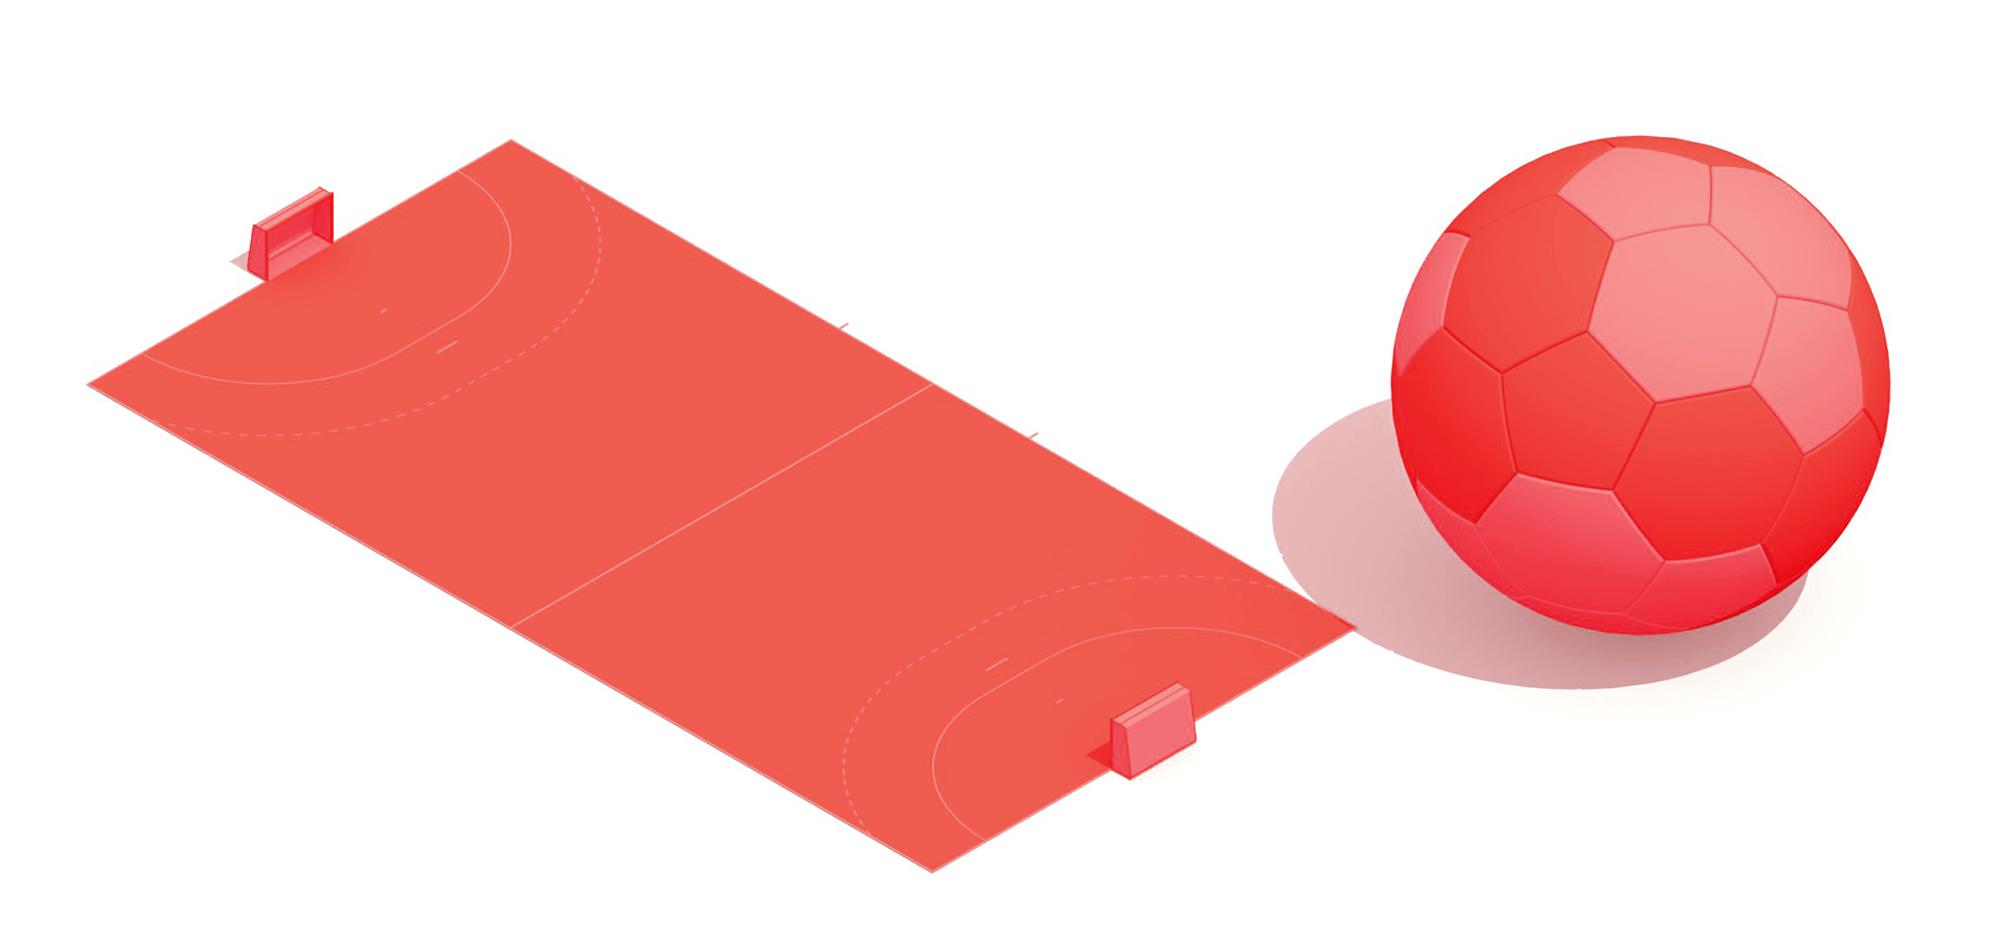 Pair of 3D perspective views of a Handball court and handball